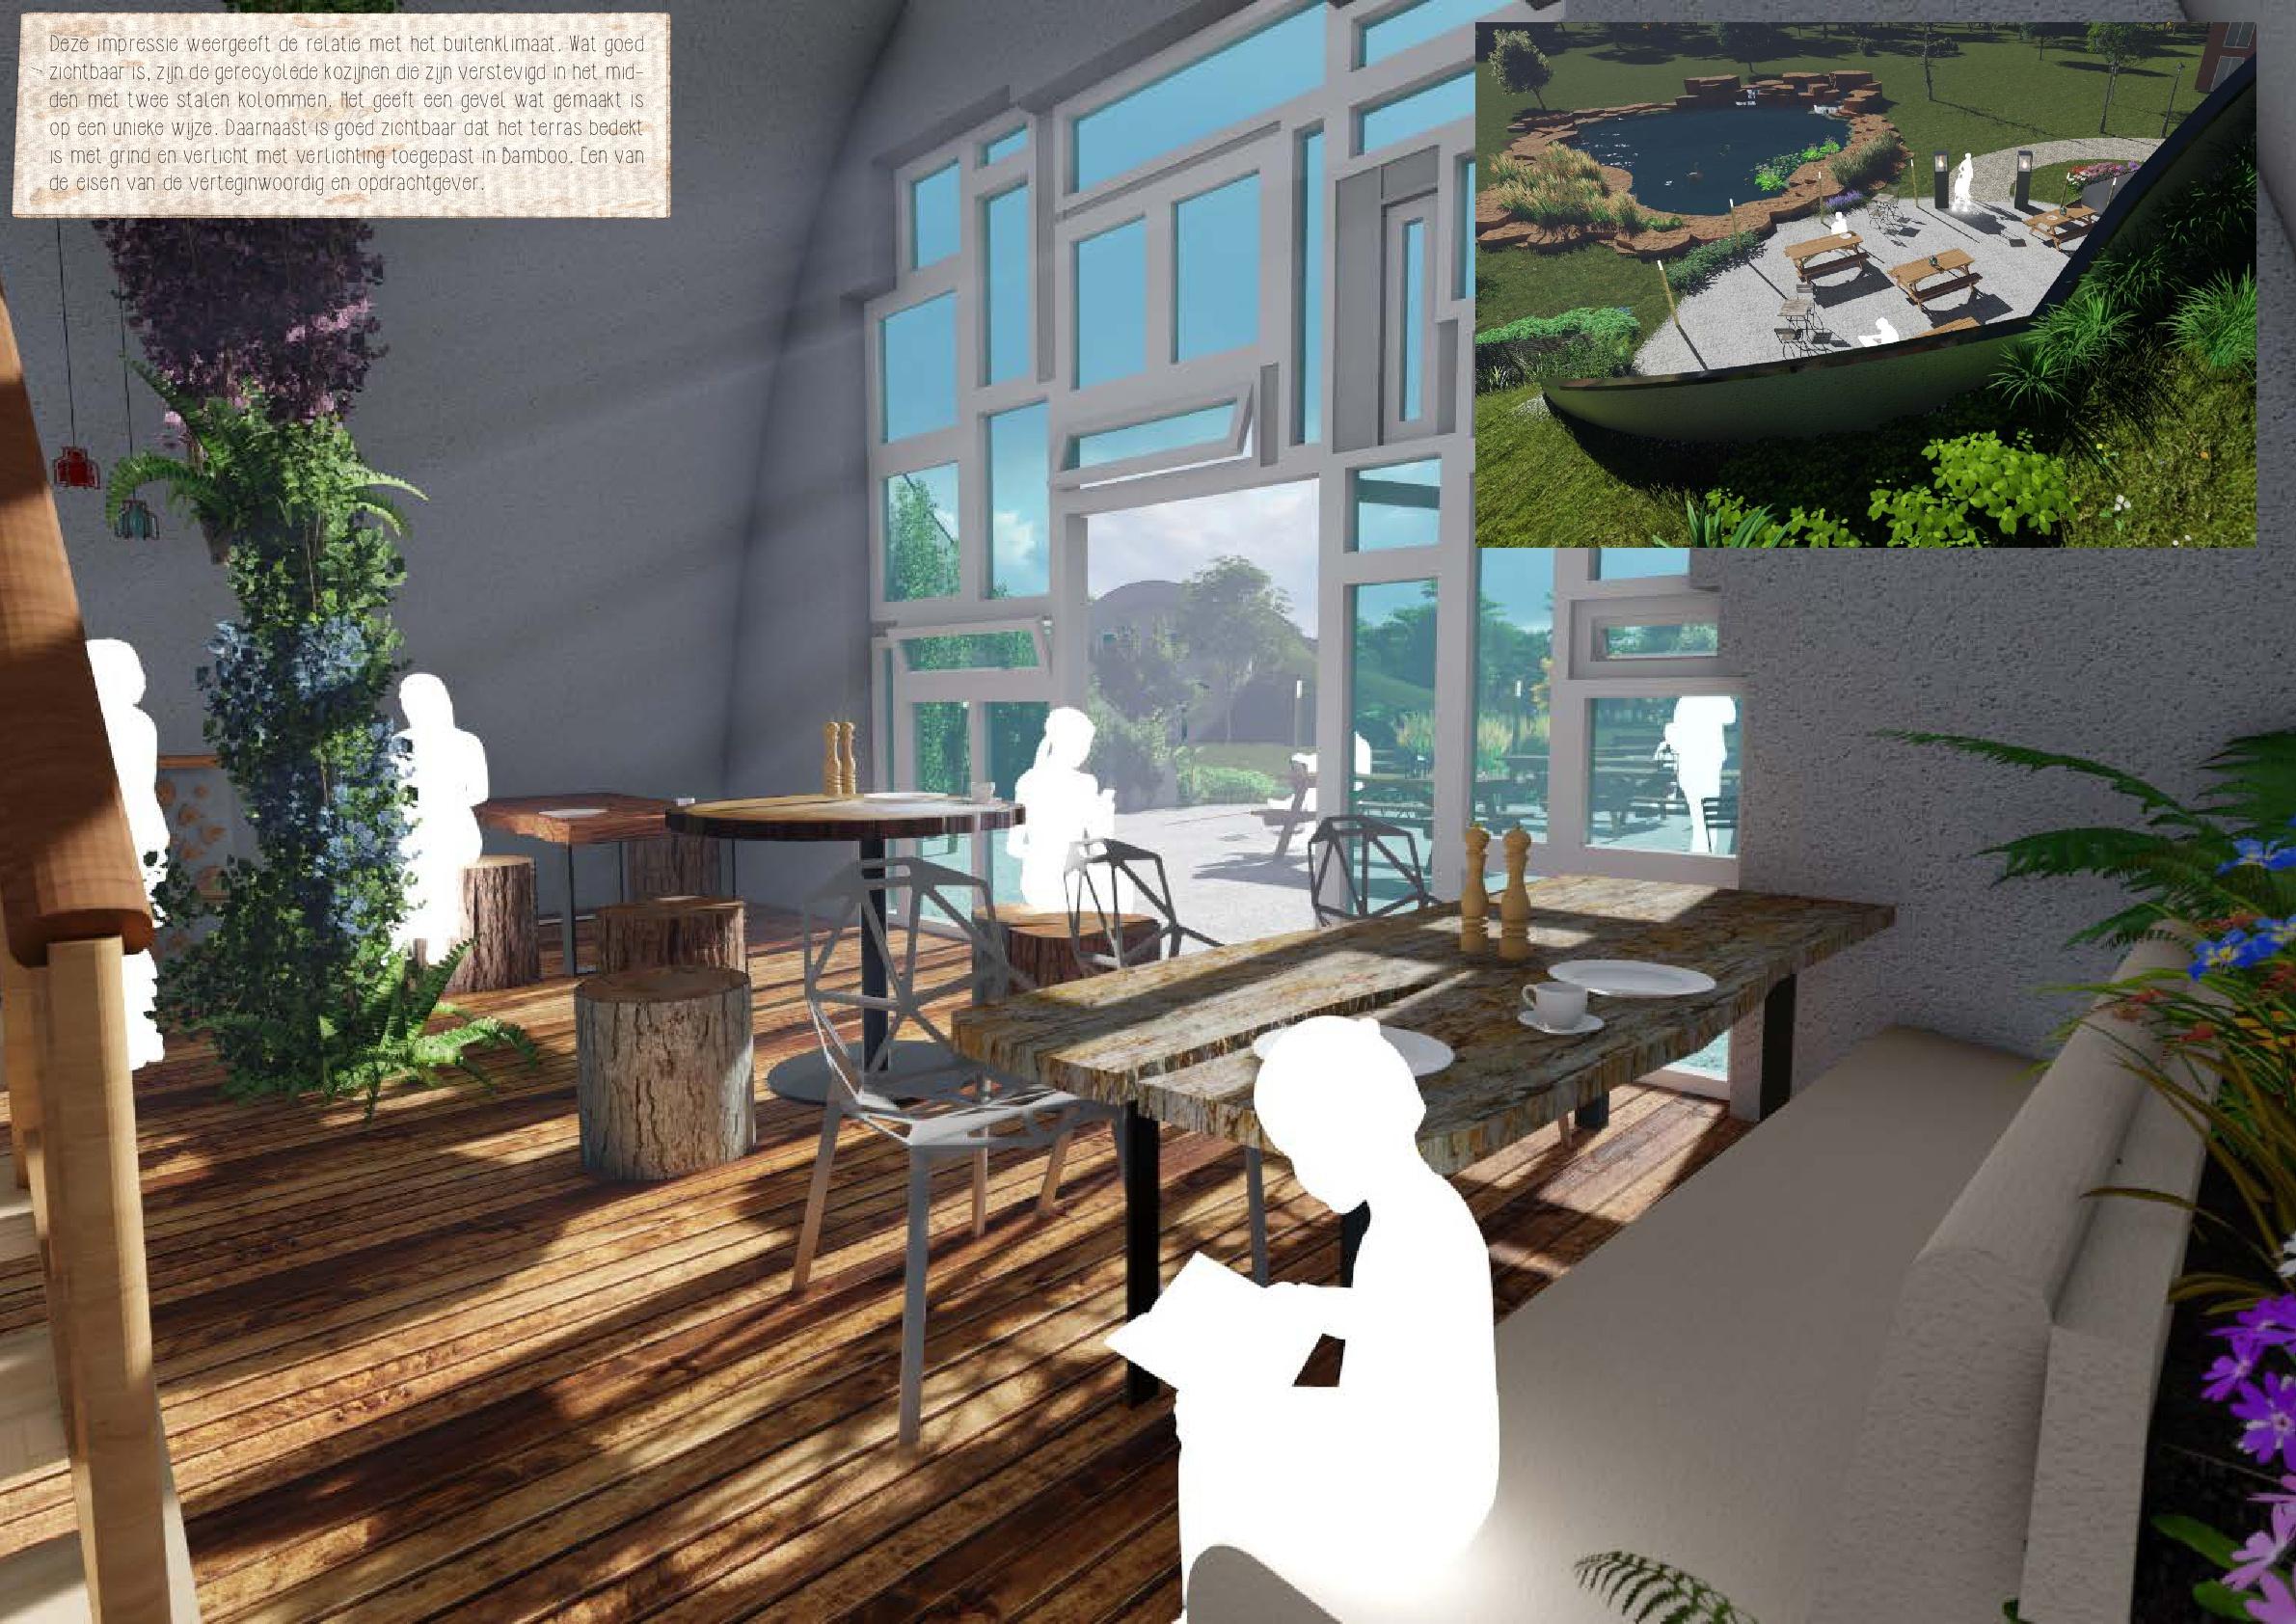 projectverslag-v2.8-inlever-025